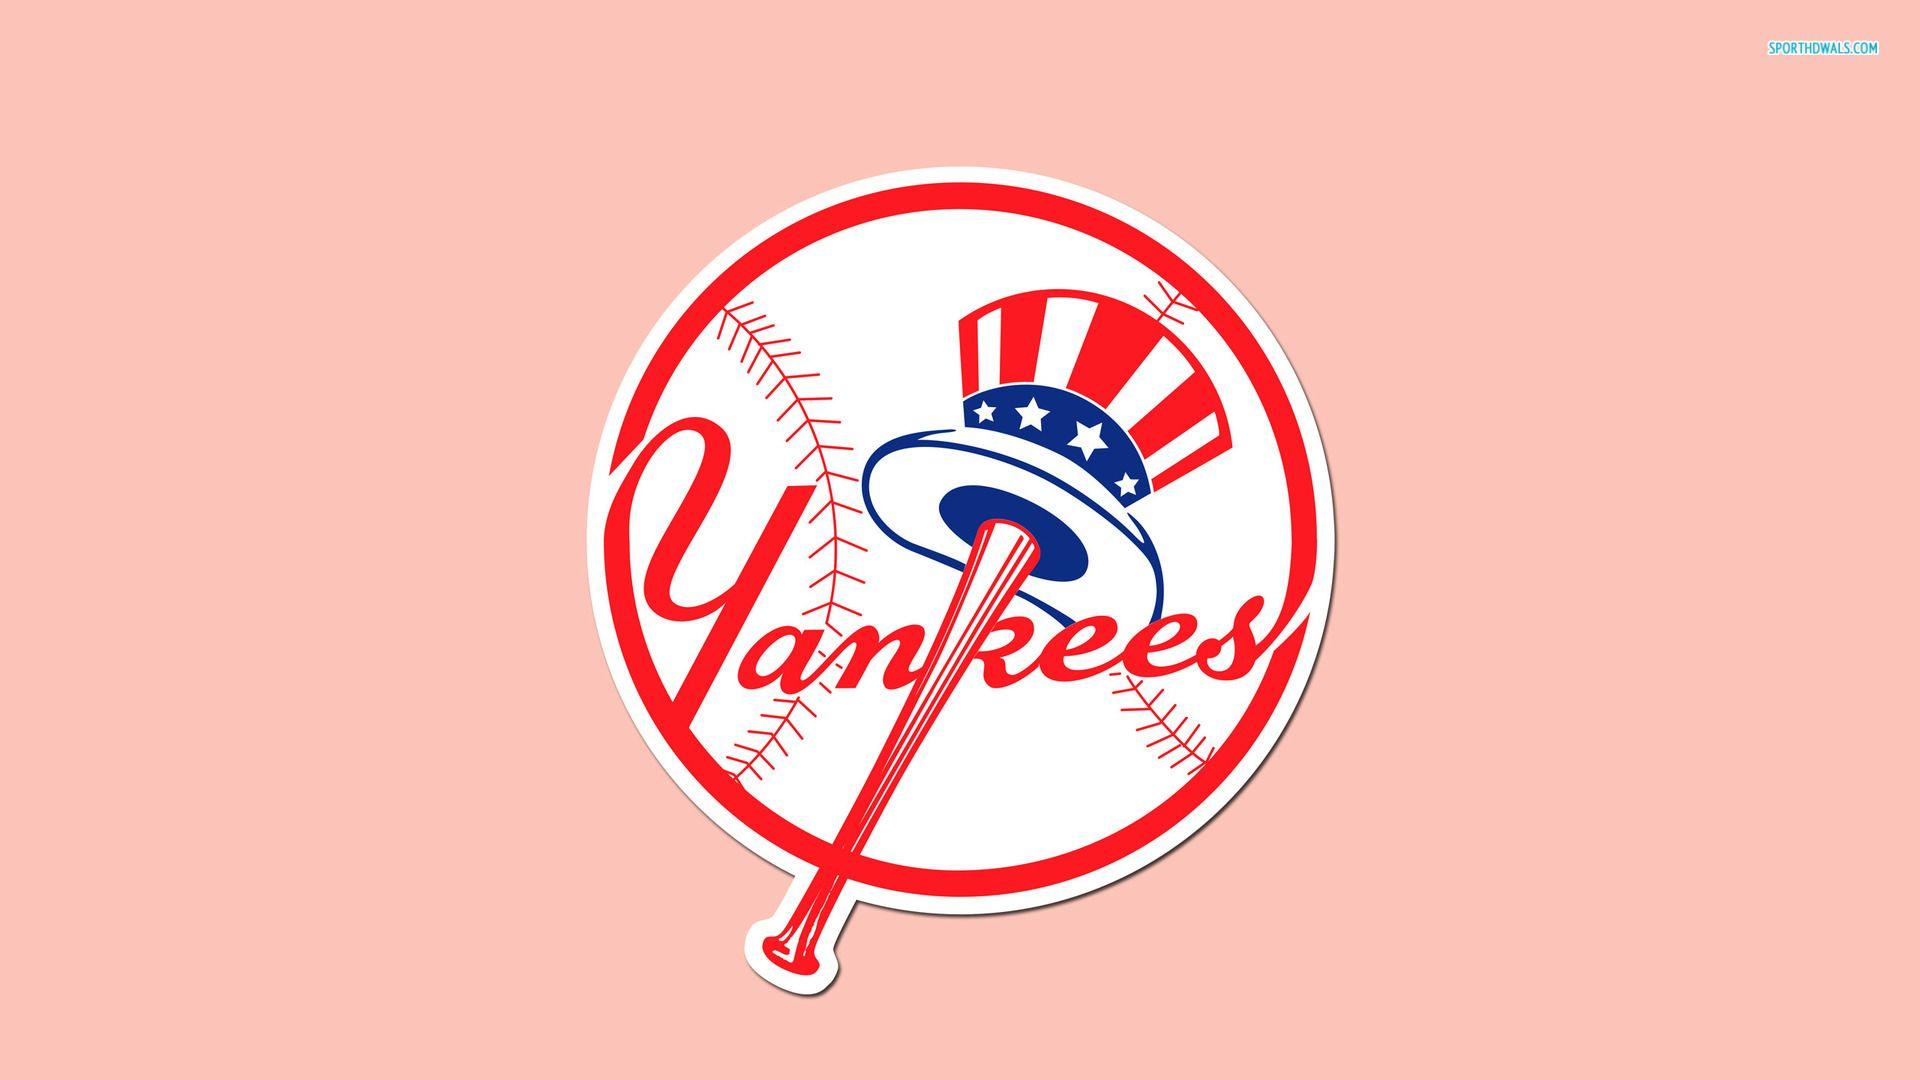 New York Yankees jpg picture